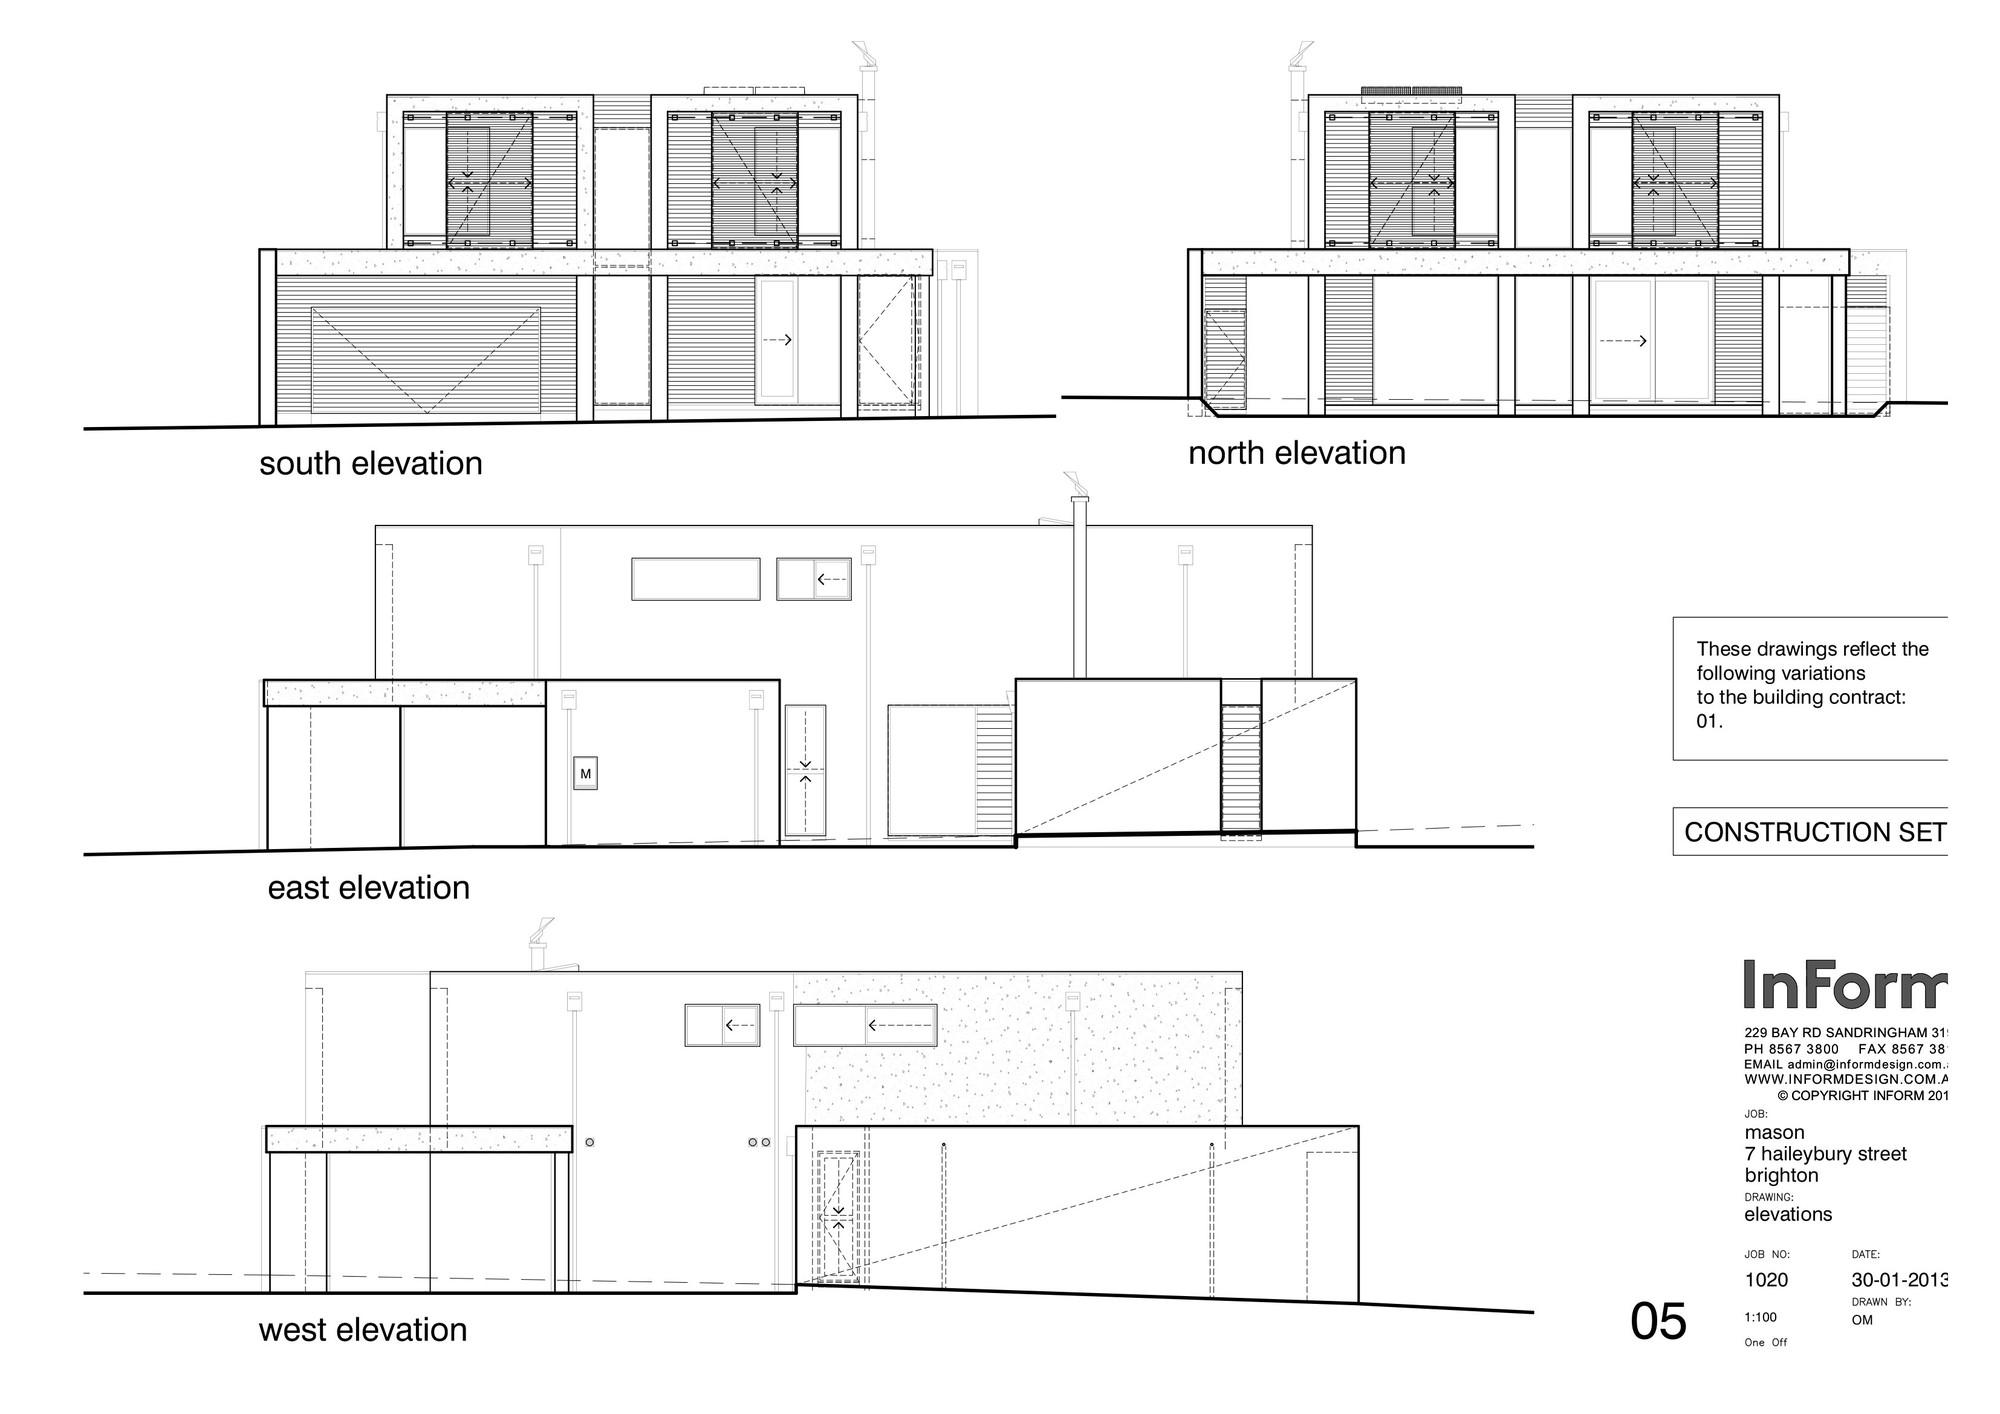 galeria de casa brighton inform 13. Black Bedroom Furniture Sets. Home Design Ideas